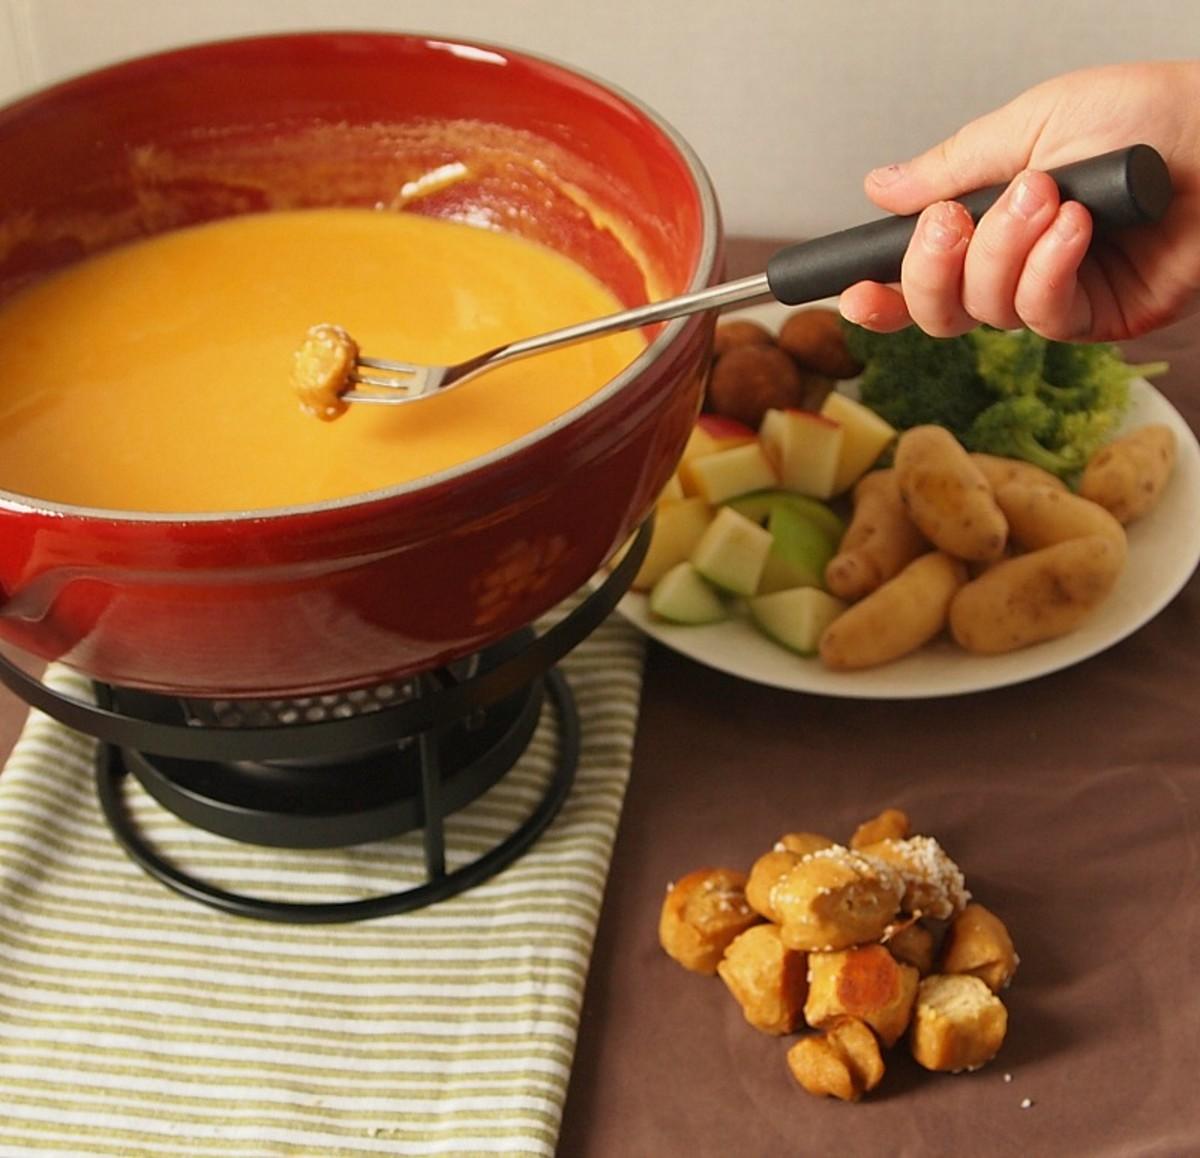 cheddar fondue with soft pretzels